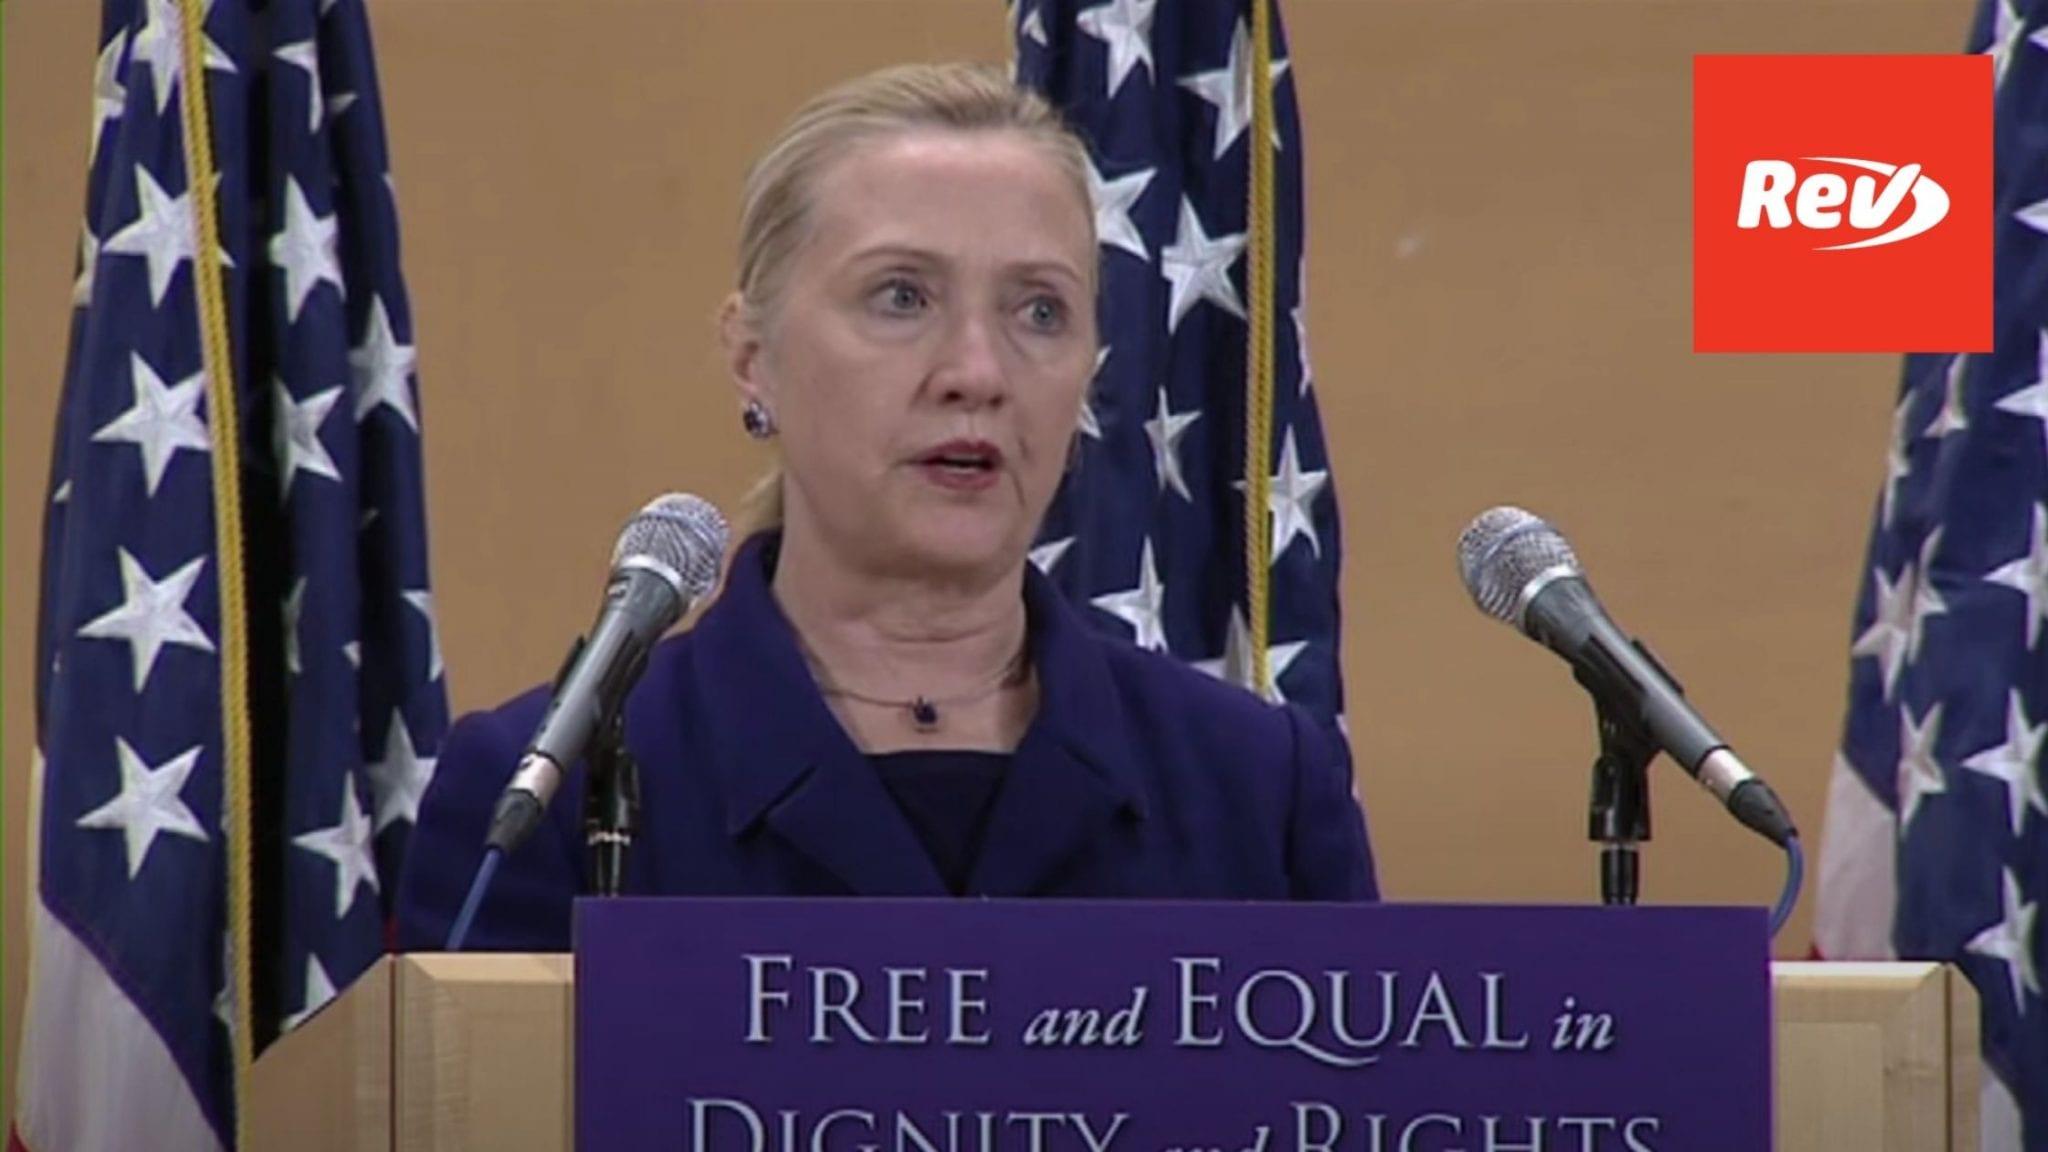 Hillary Clinton LGBTQ Rights Speech Transcript UN 2011